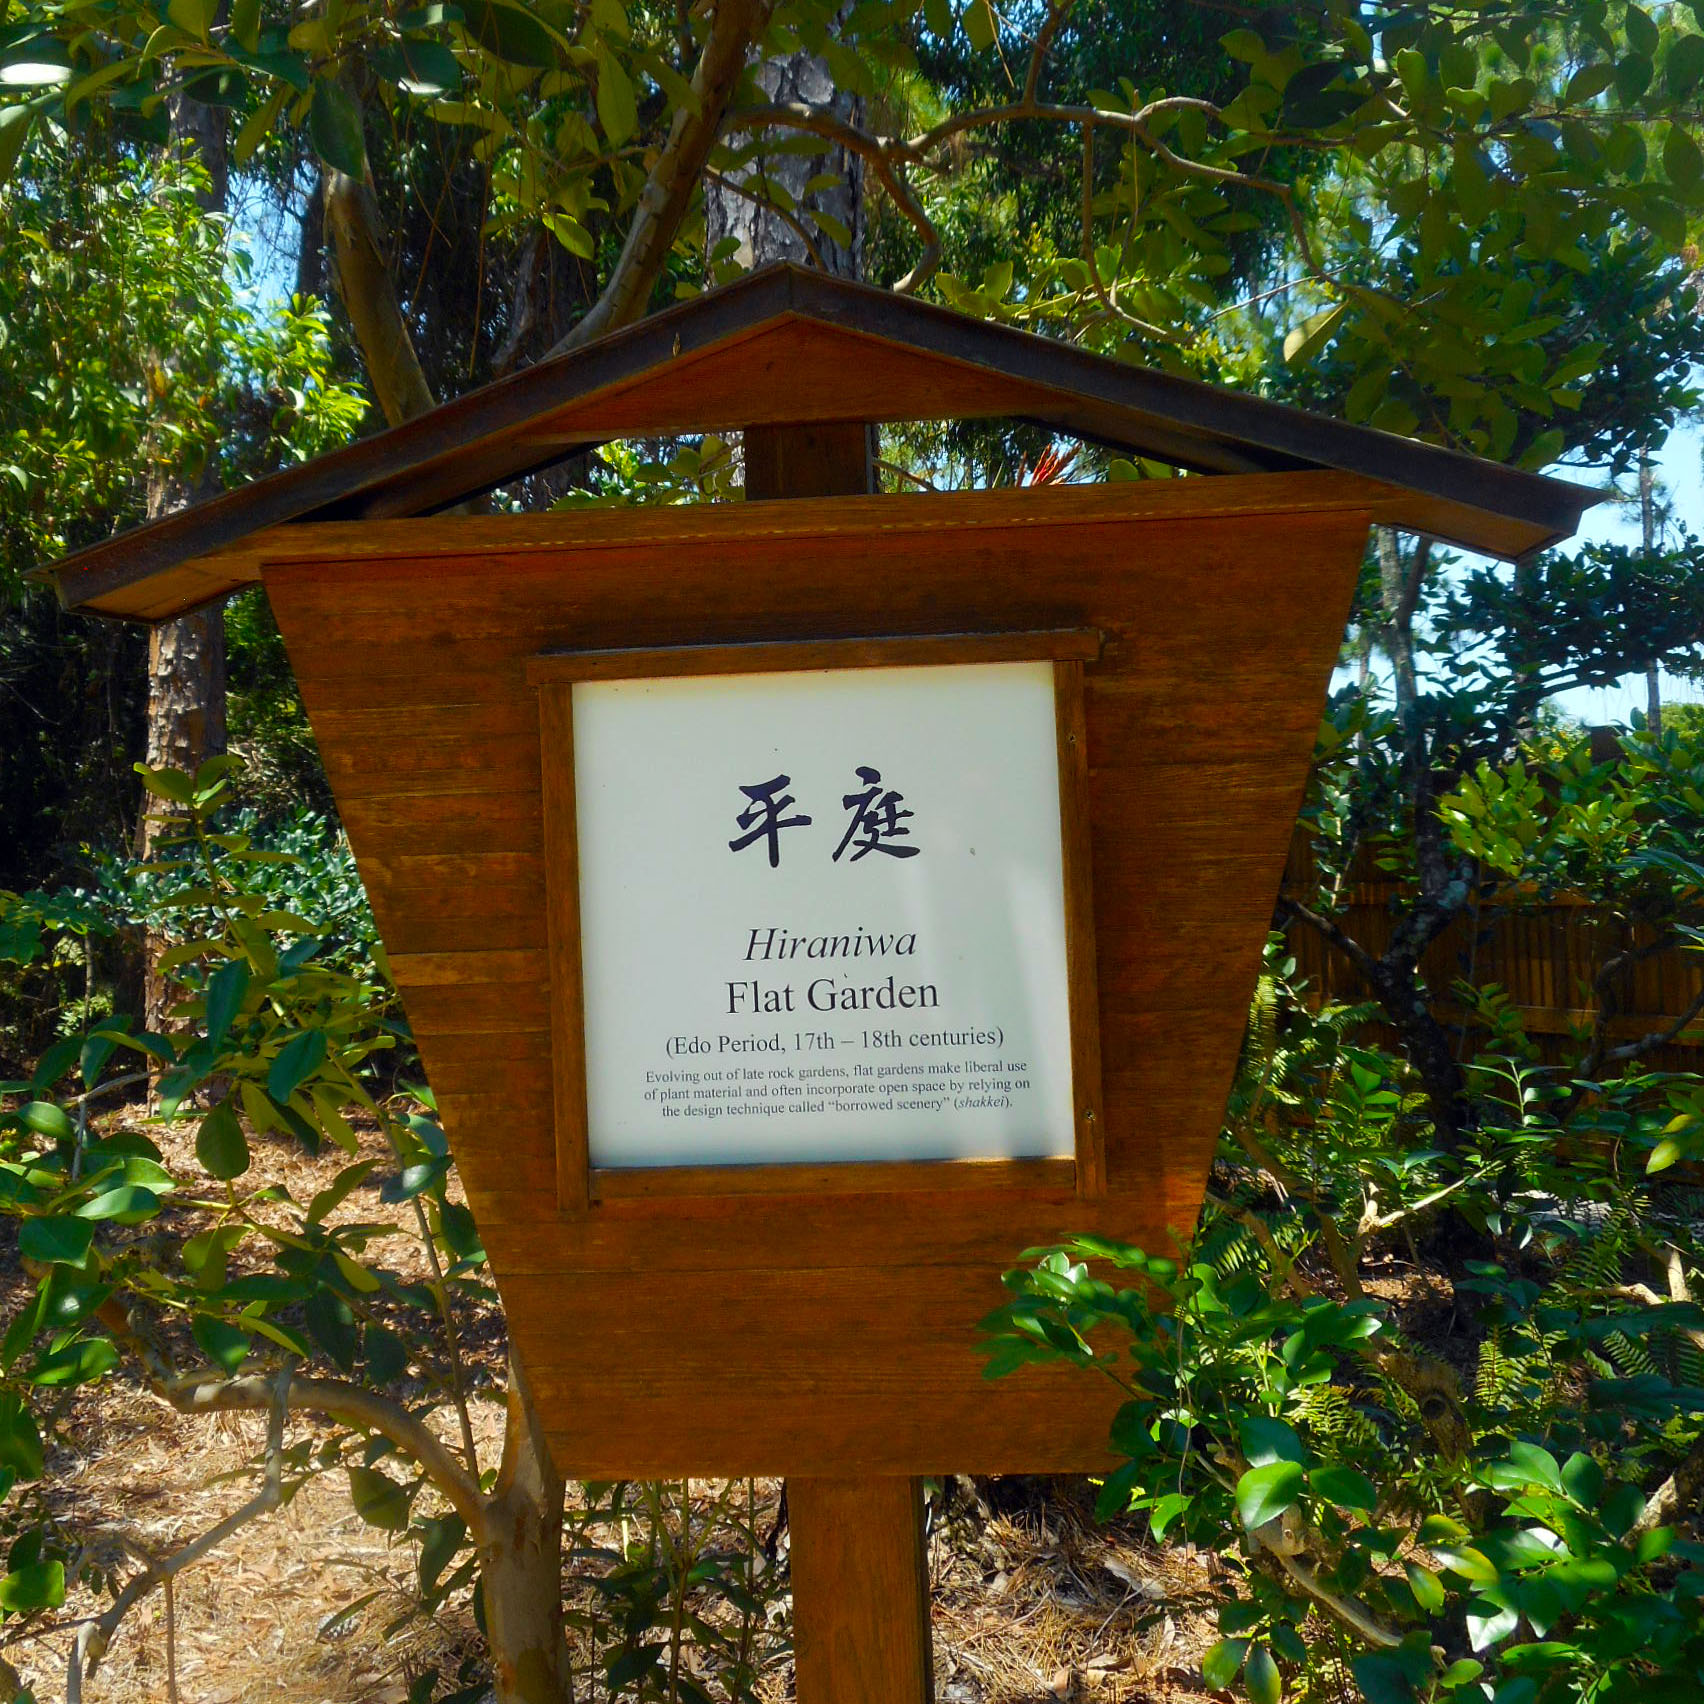 File:Morikami Museum and Gardens - Hiraniwa - Flat Garden Sign.jpg ...